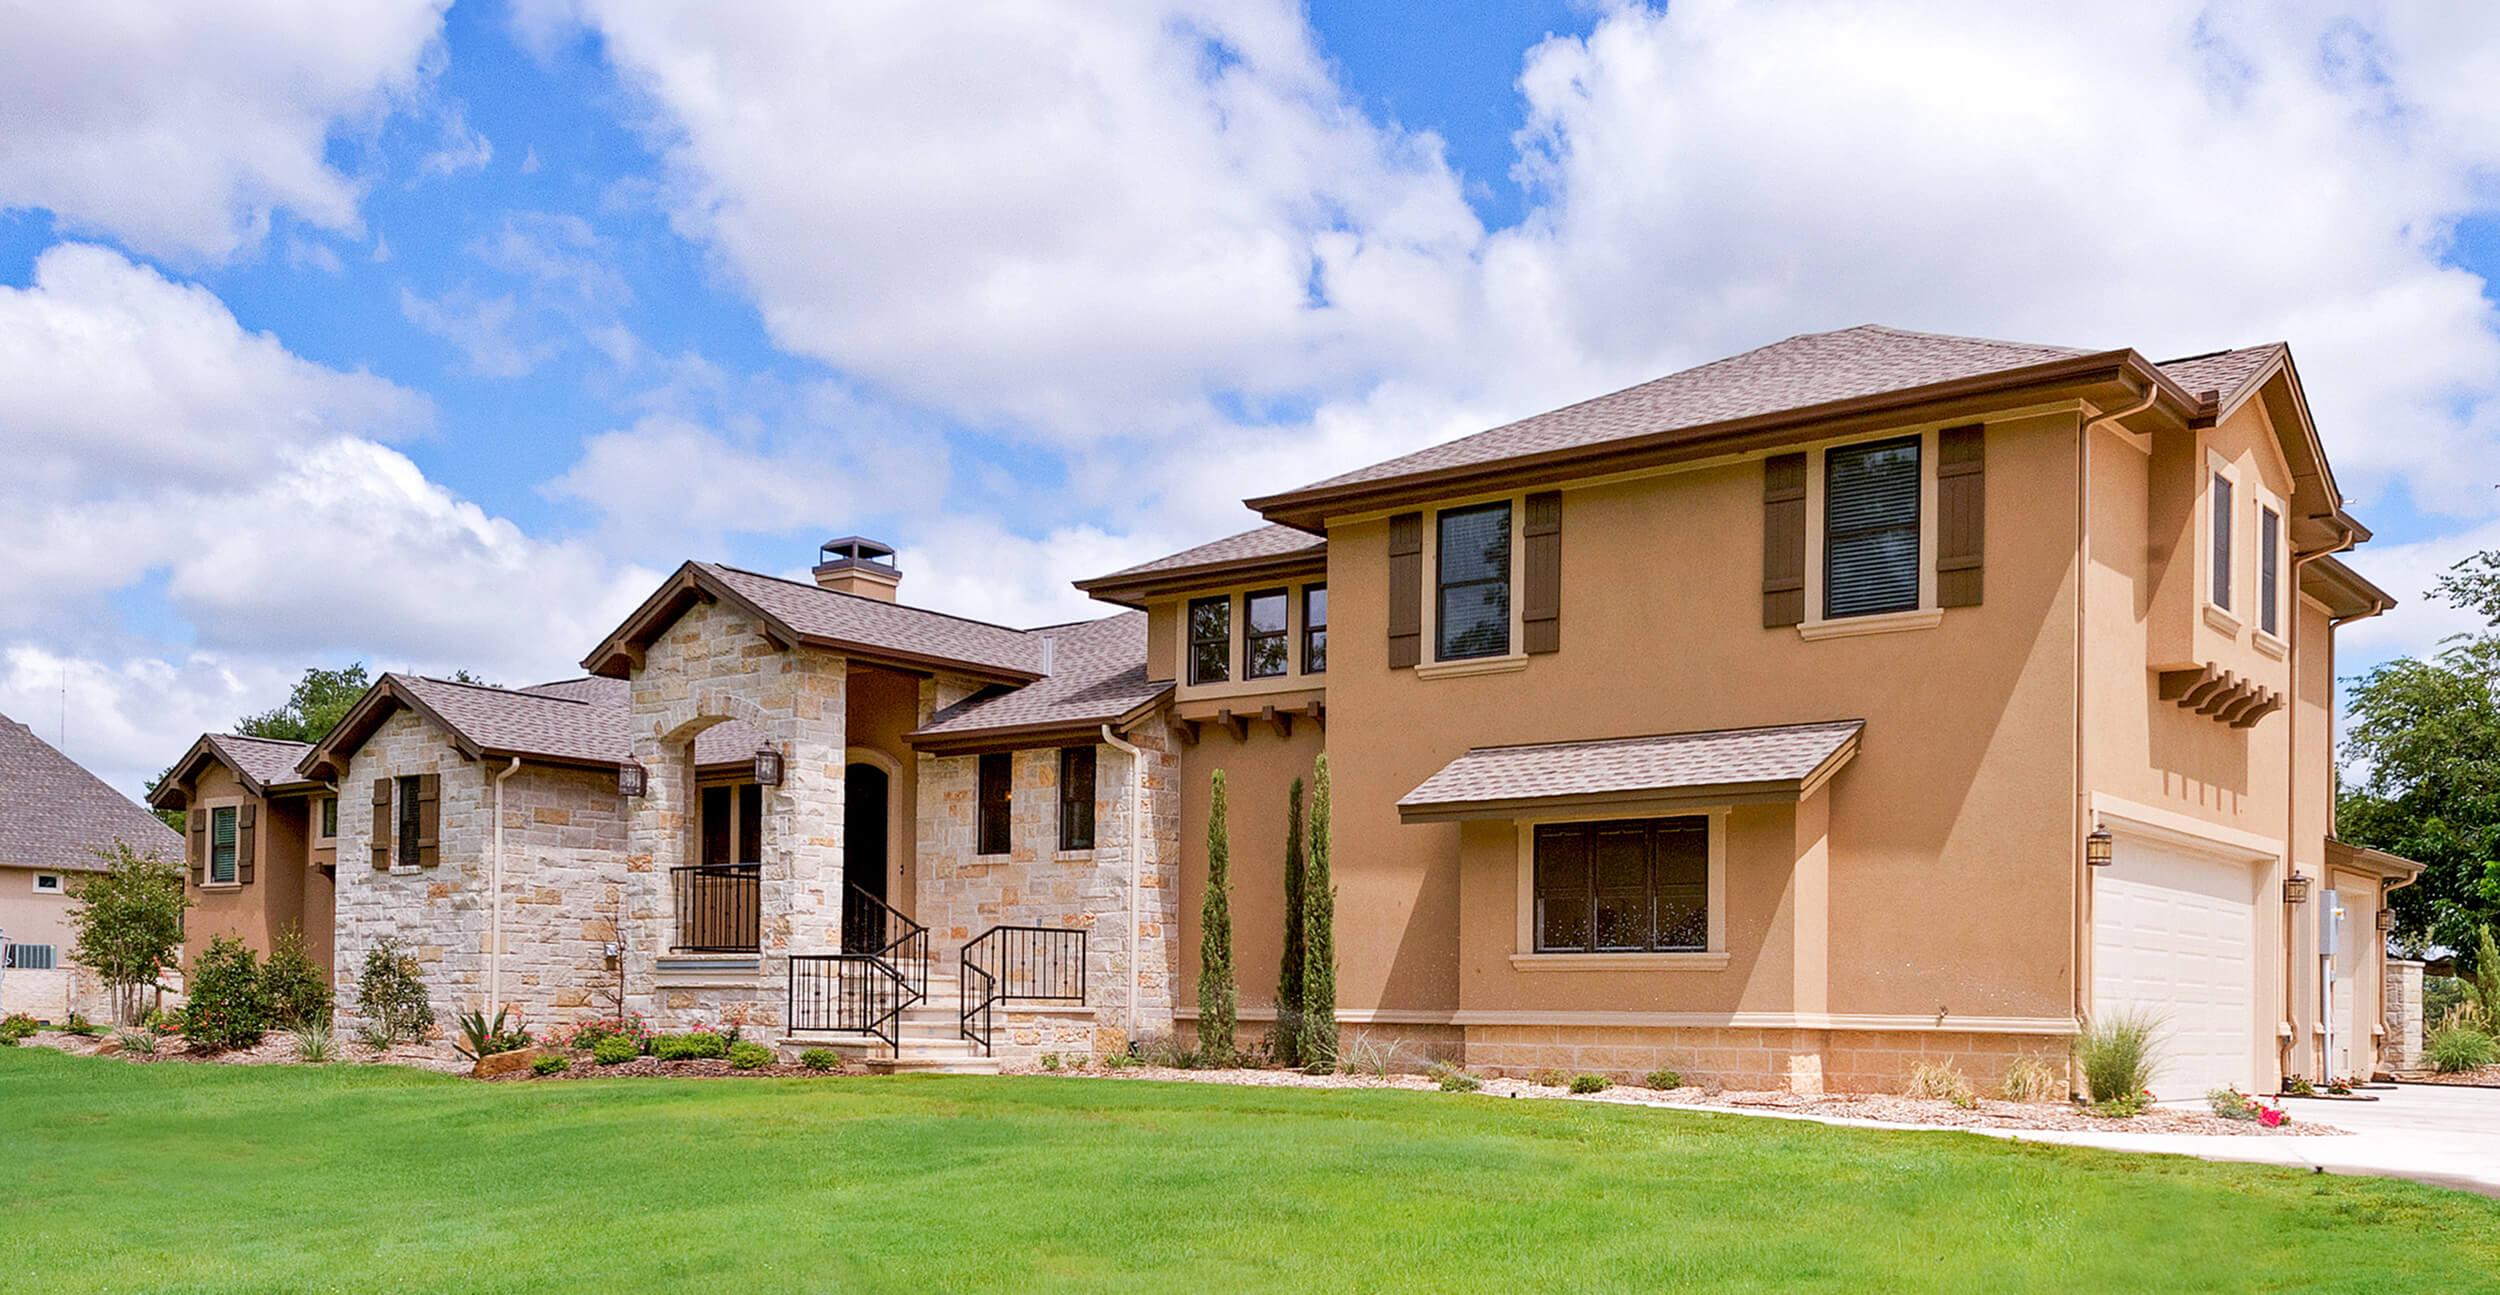 Steve_Bumpas_Custom_Homes_Granbury_Driftwood_Ranch_01_02.jpg